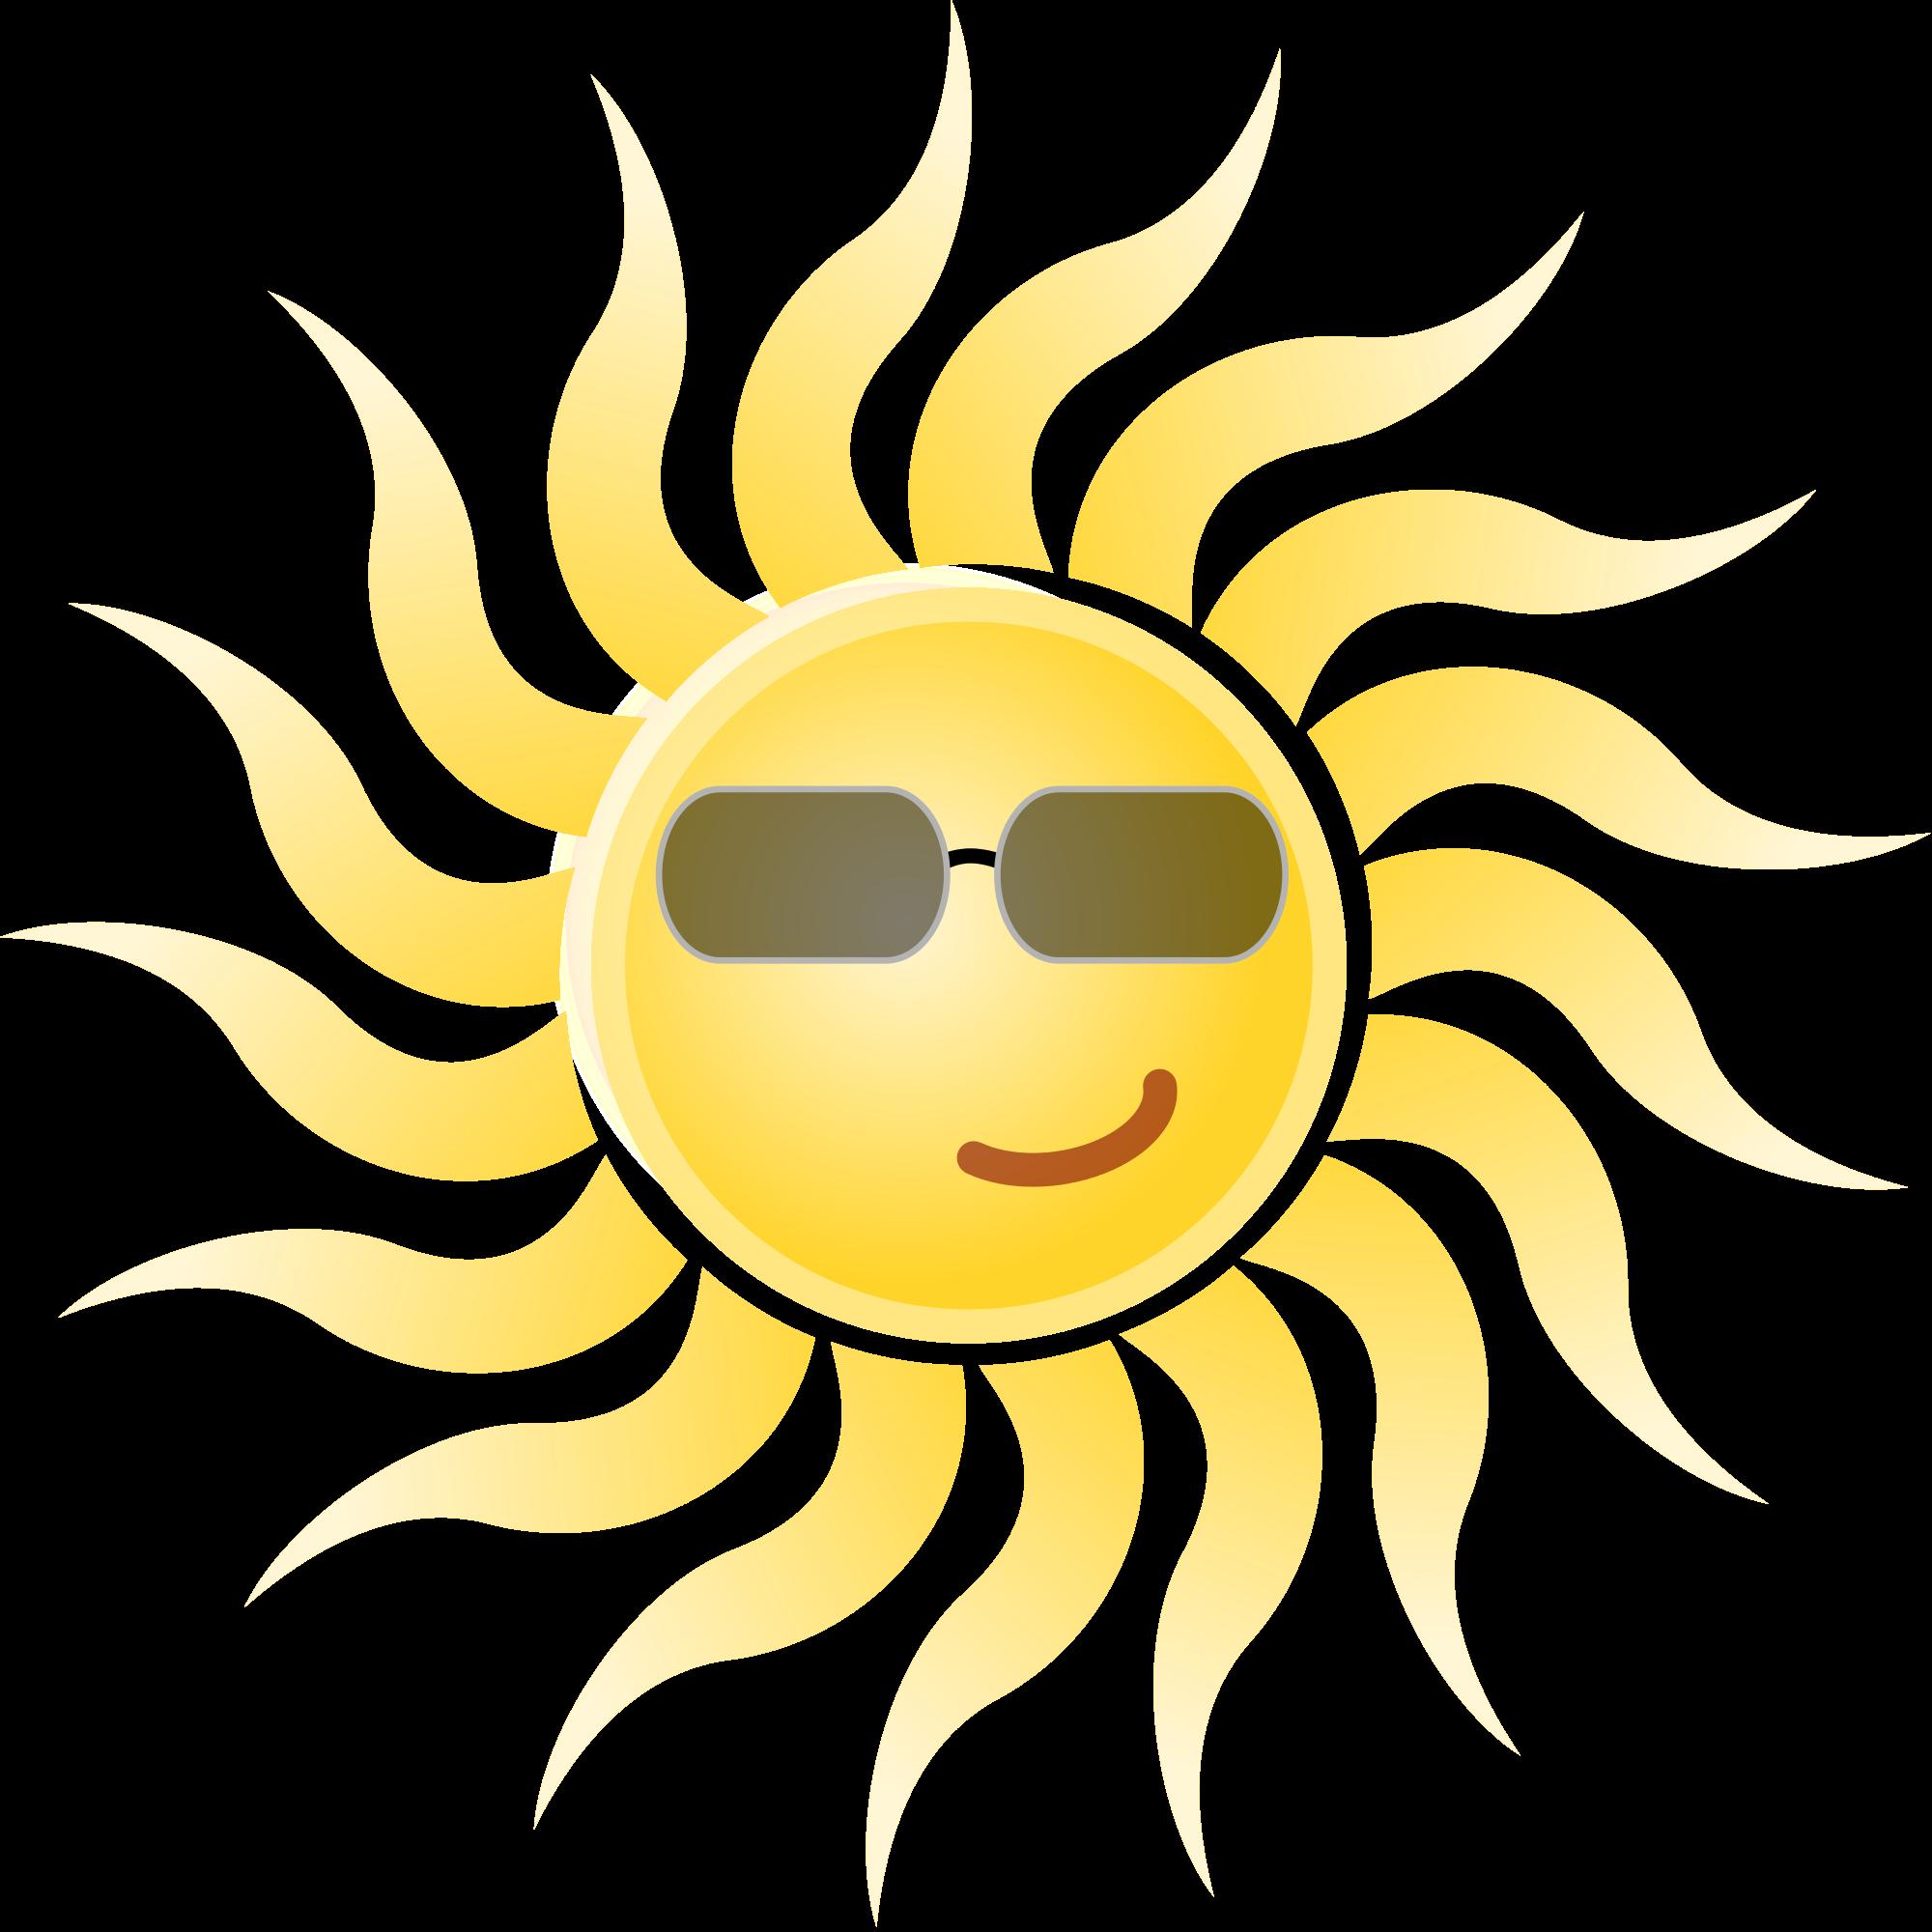 Sunny clipart real. File sun wearing sunglasses